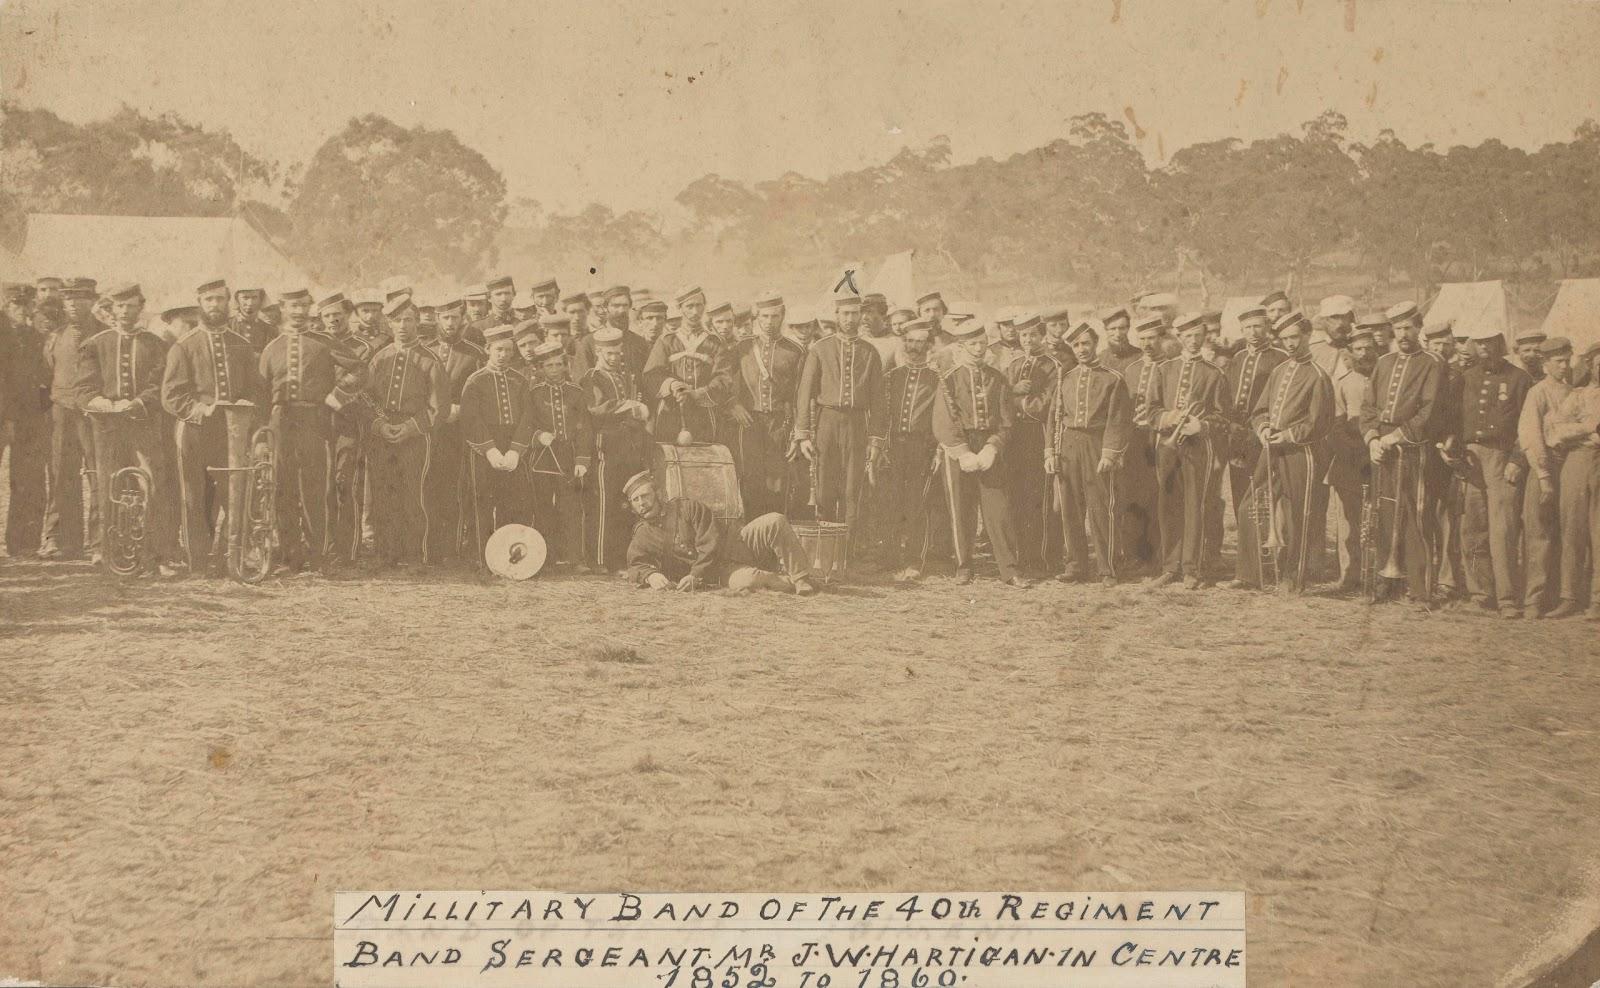 40th Regiment Band 1852 - 1860